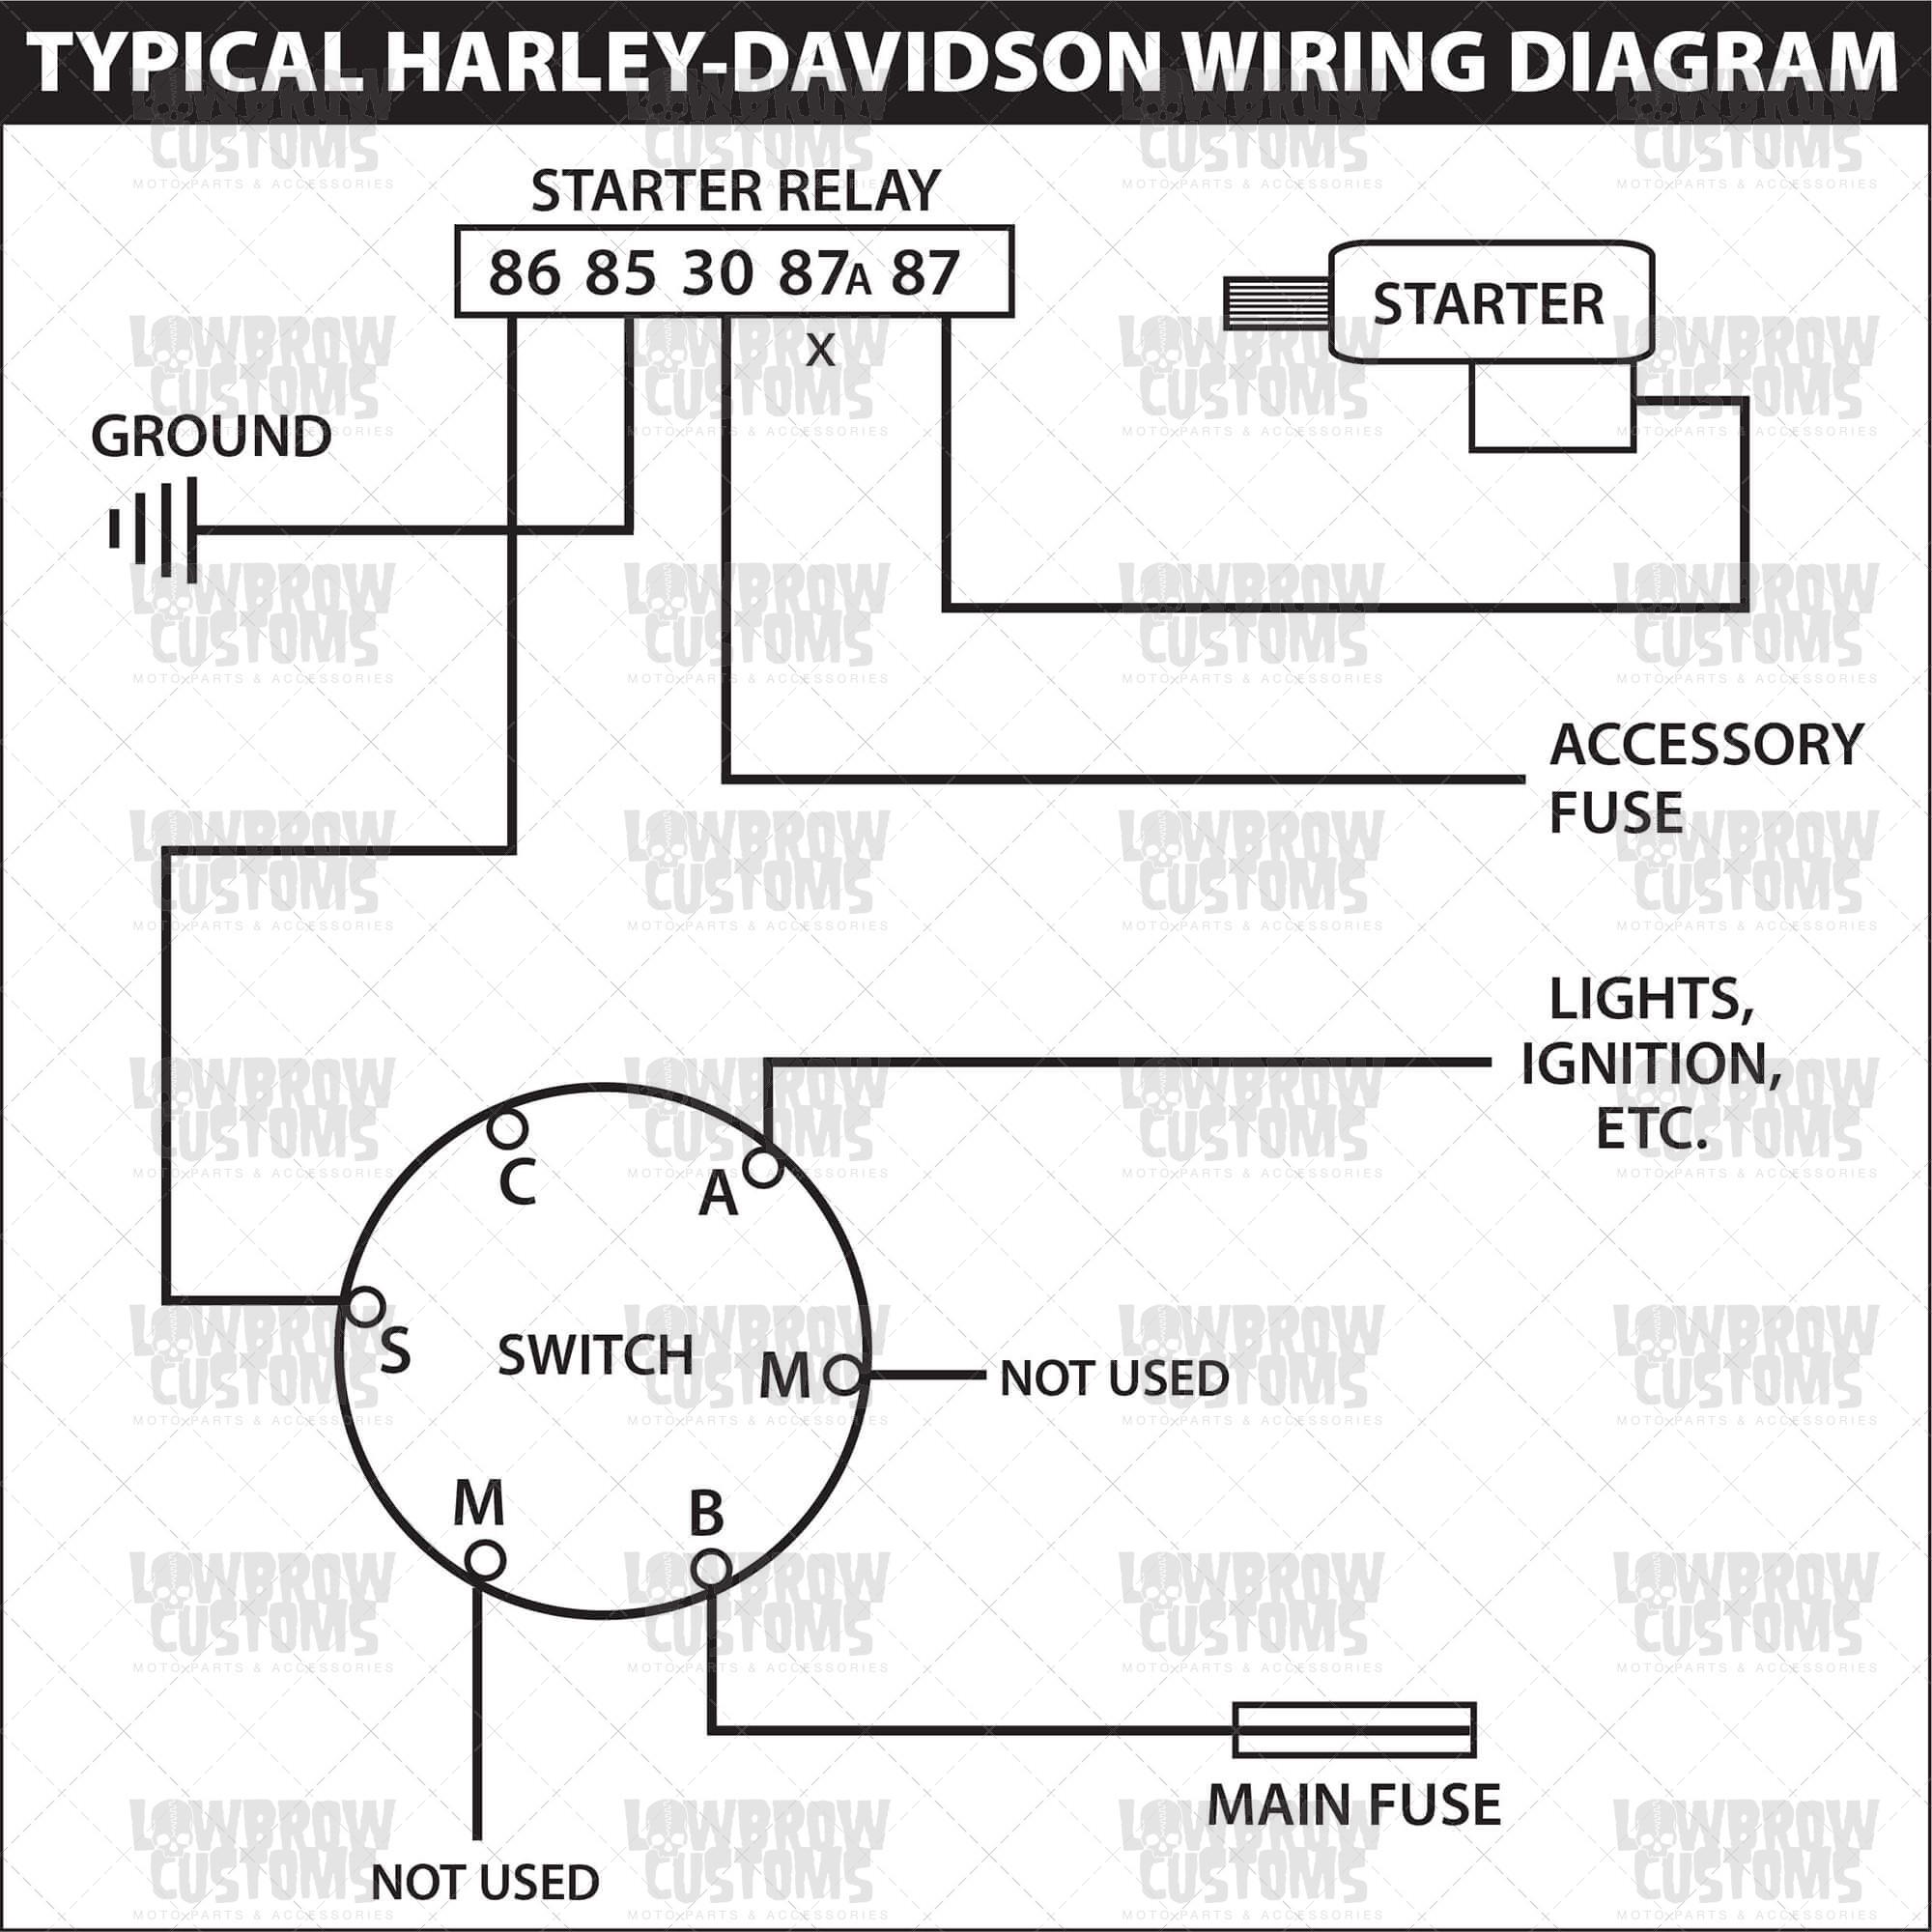 4 Wire Ignition Switch Wiring Diagram | Wiring Library - Motorcycle Ignition Switch Wiring Diagram